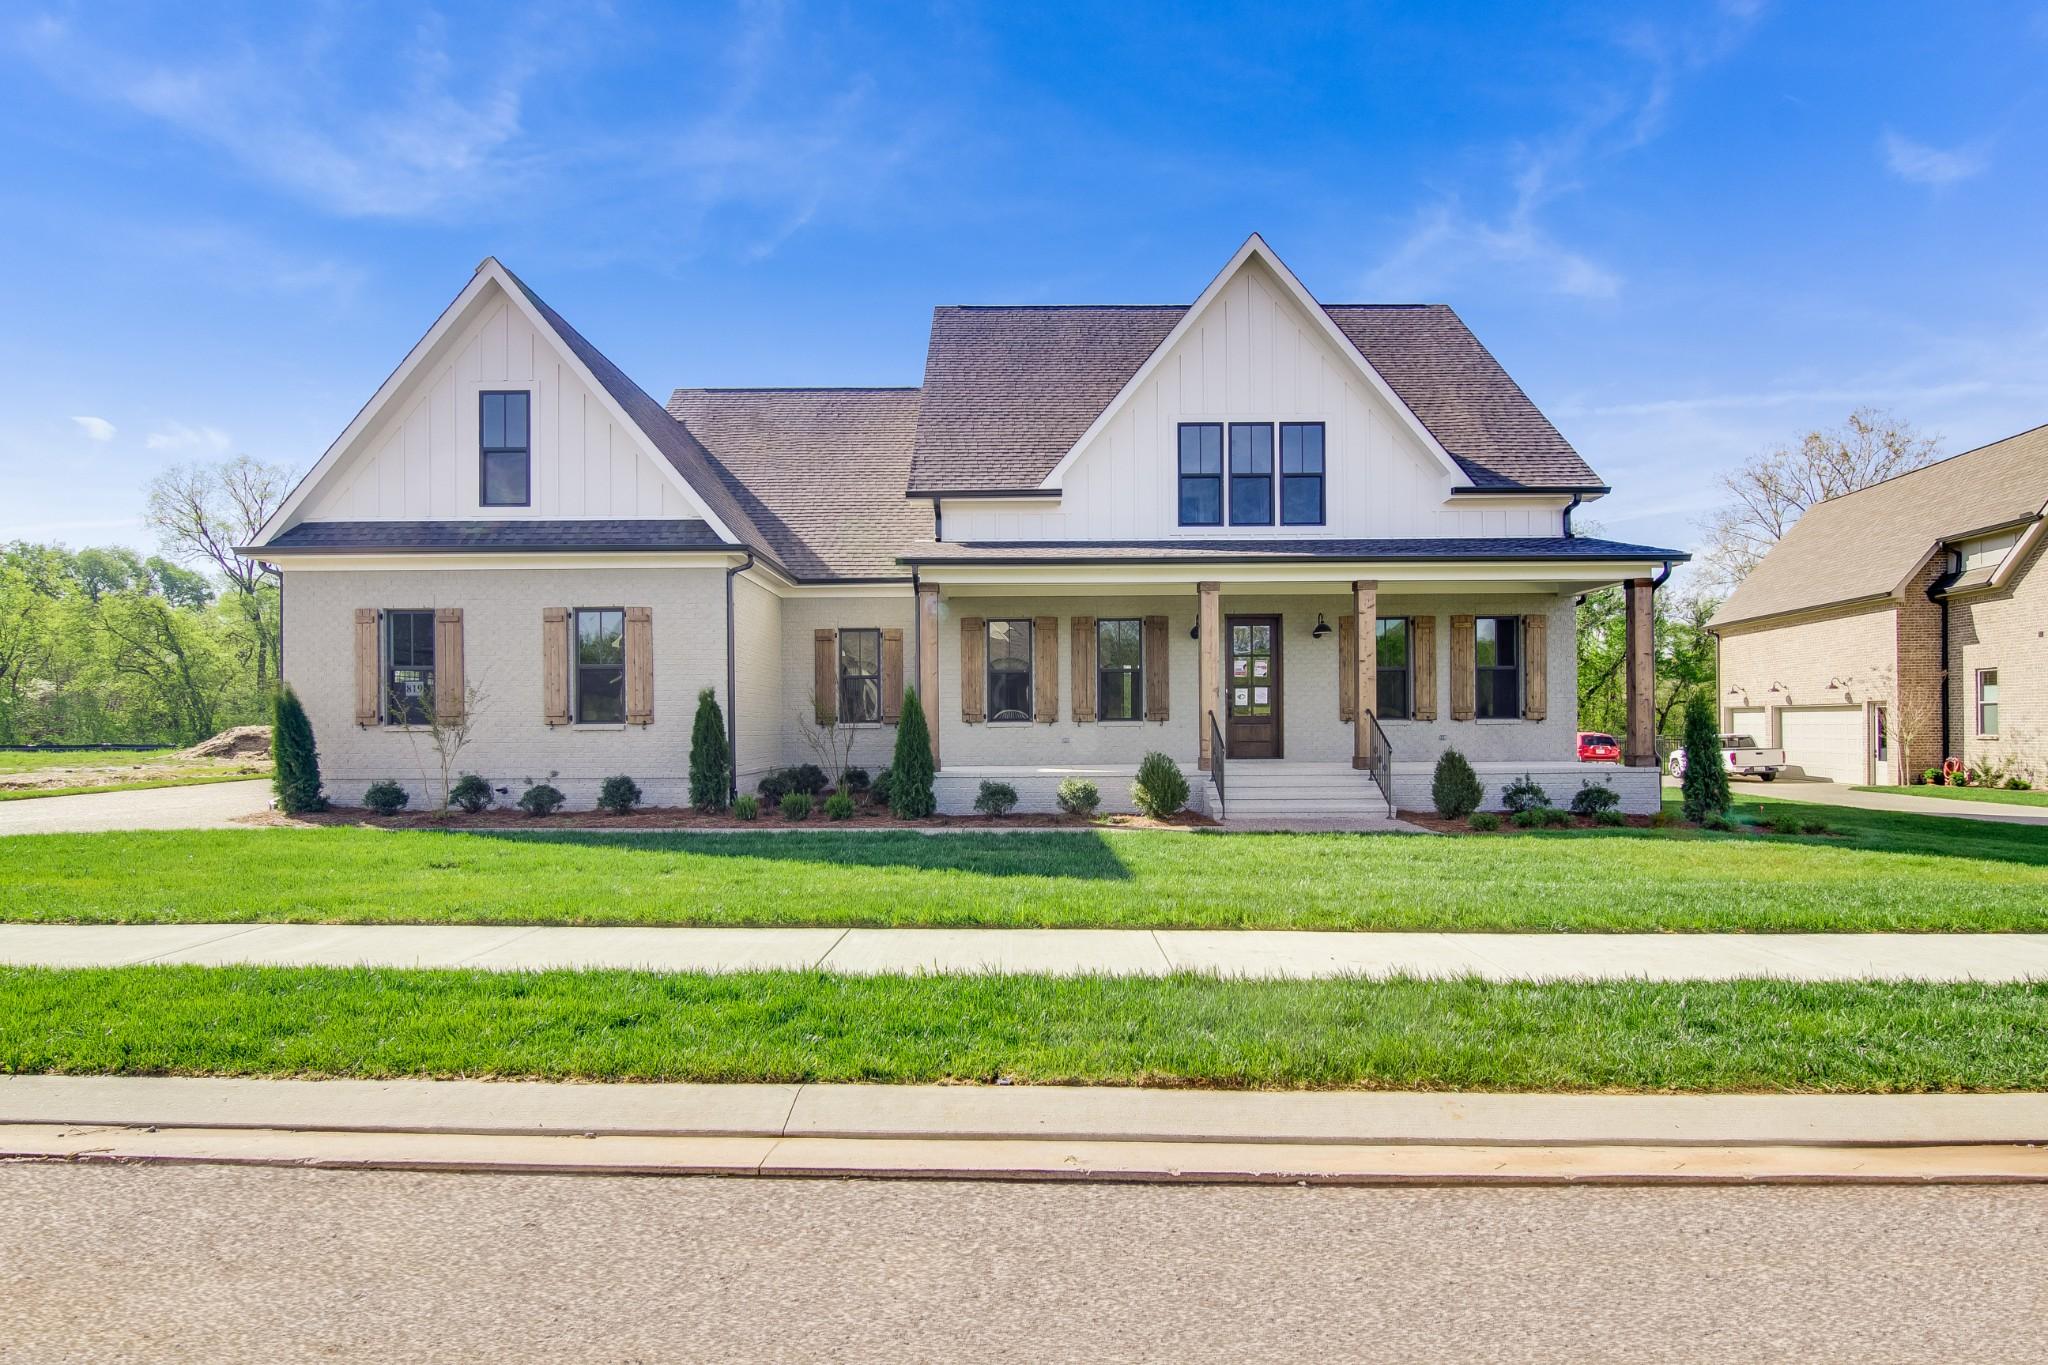 4593 Majestic Meadows Dr LOT819, Arrington, TN 37014 - Arrington, TN real estate listing